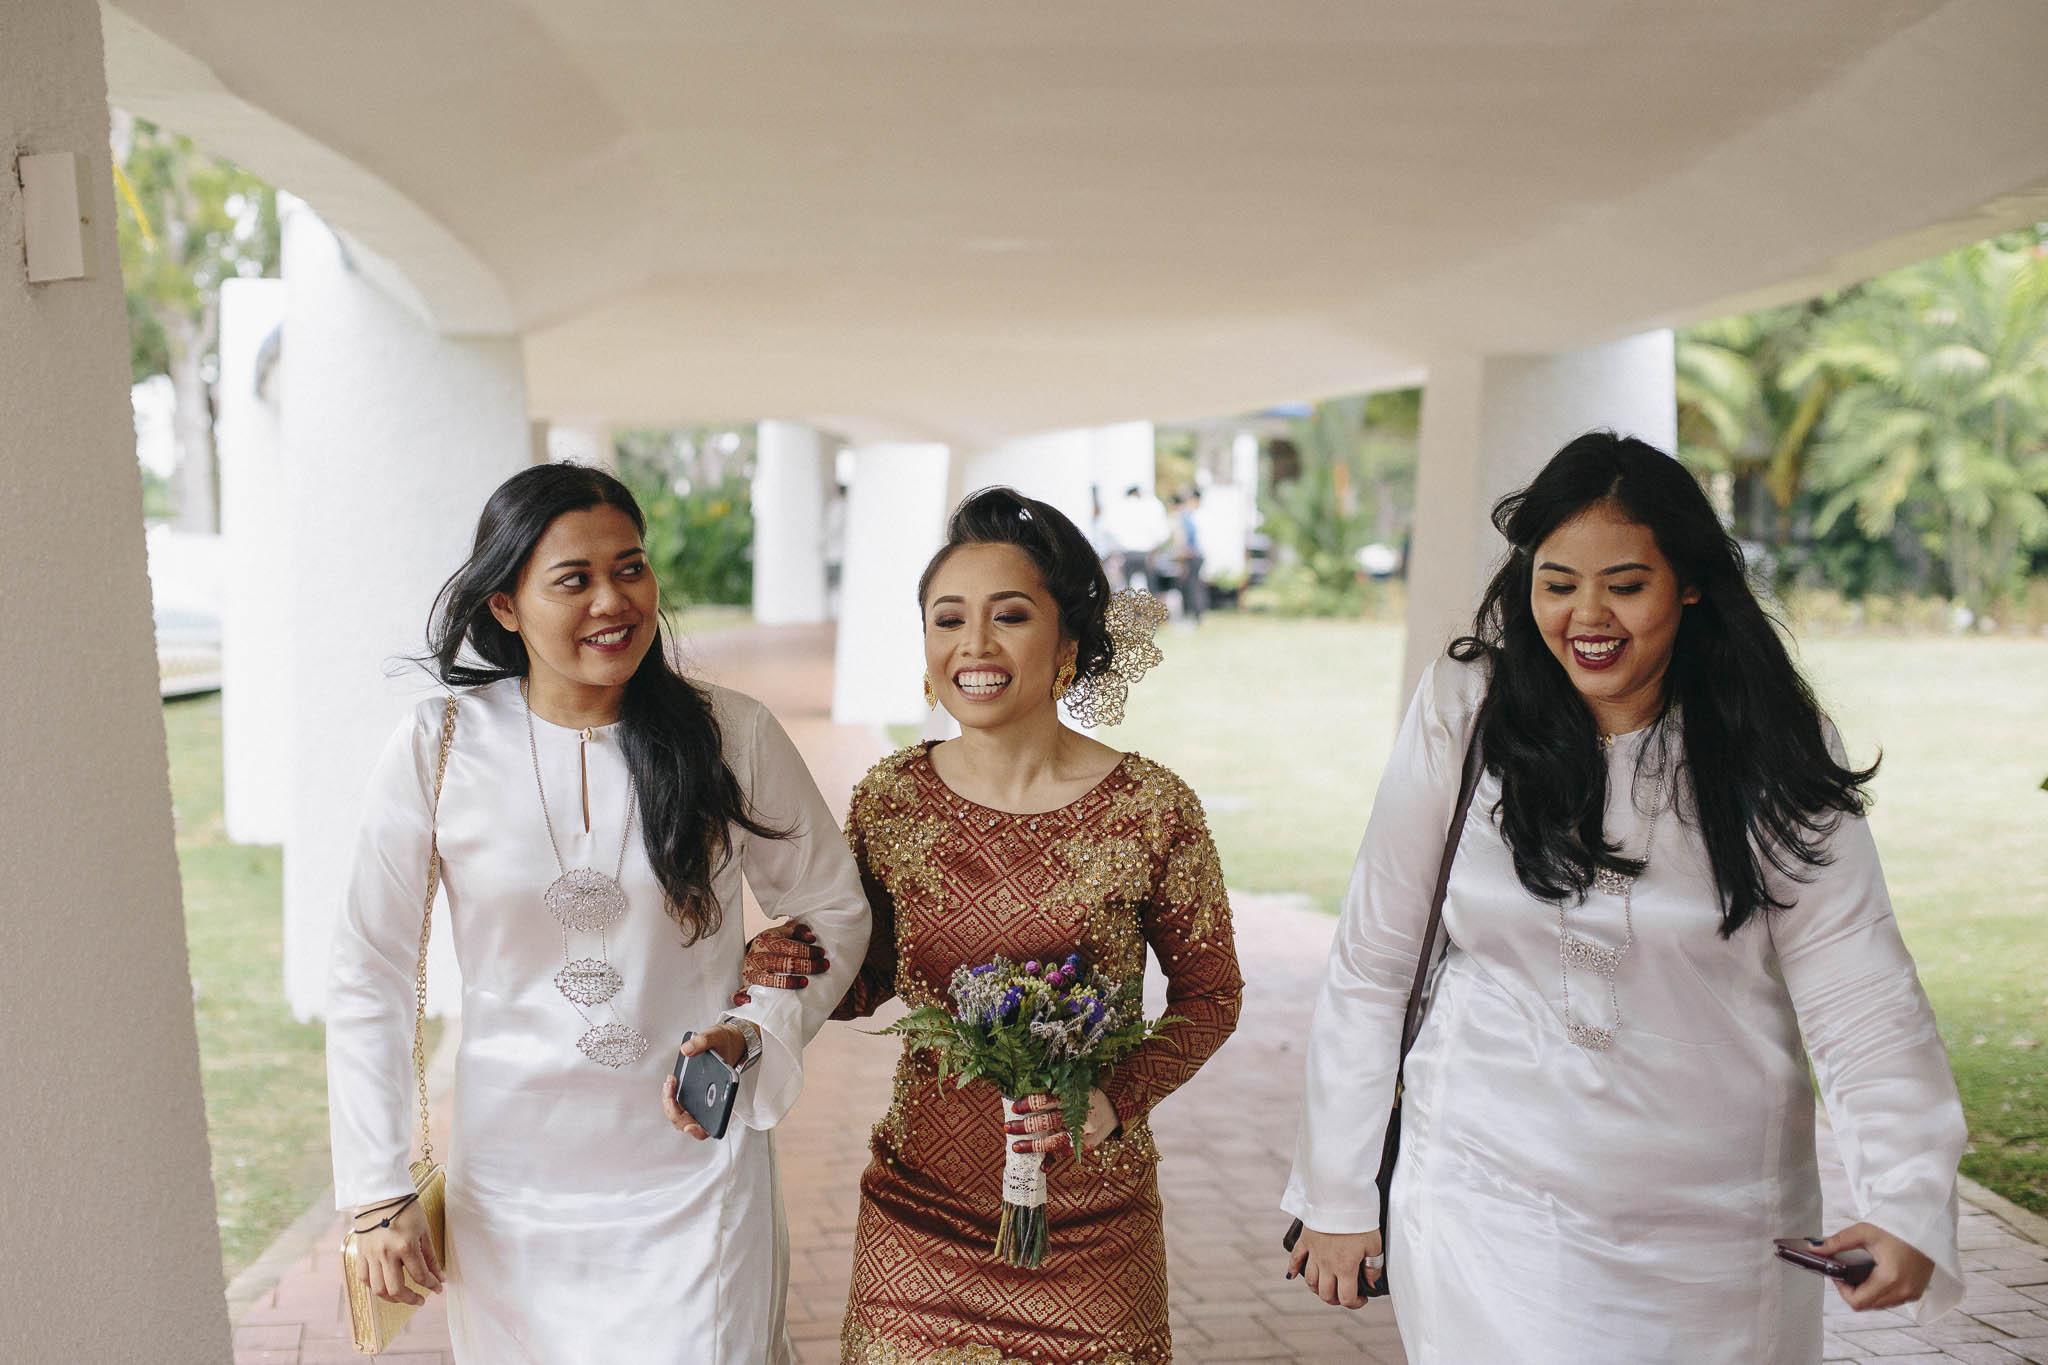 singapore-wedding-photographer-travel-khairul-atikah-40.jpg